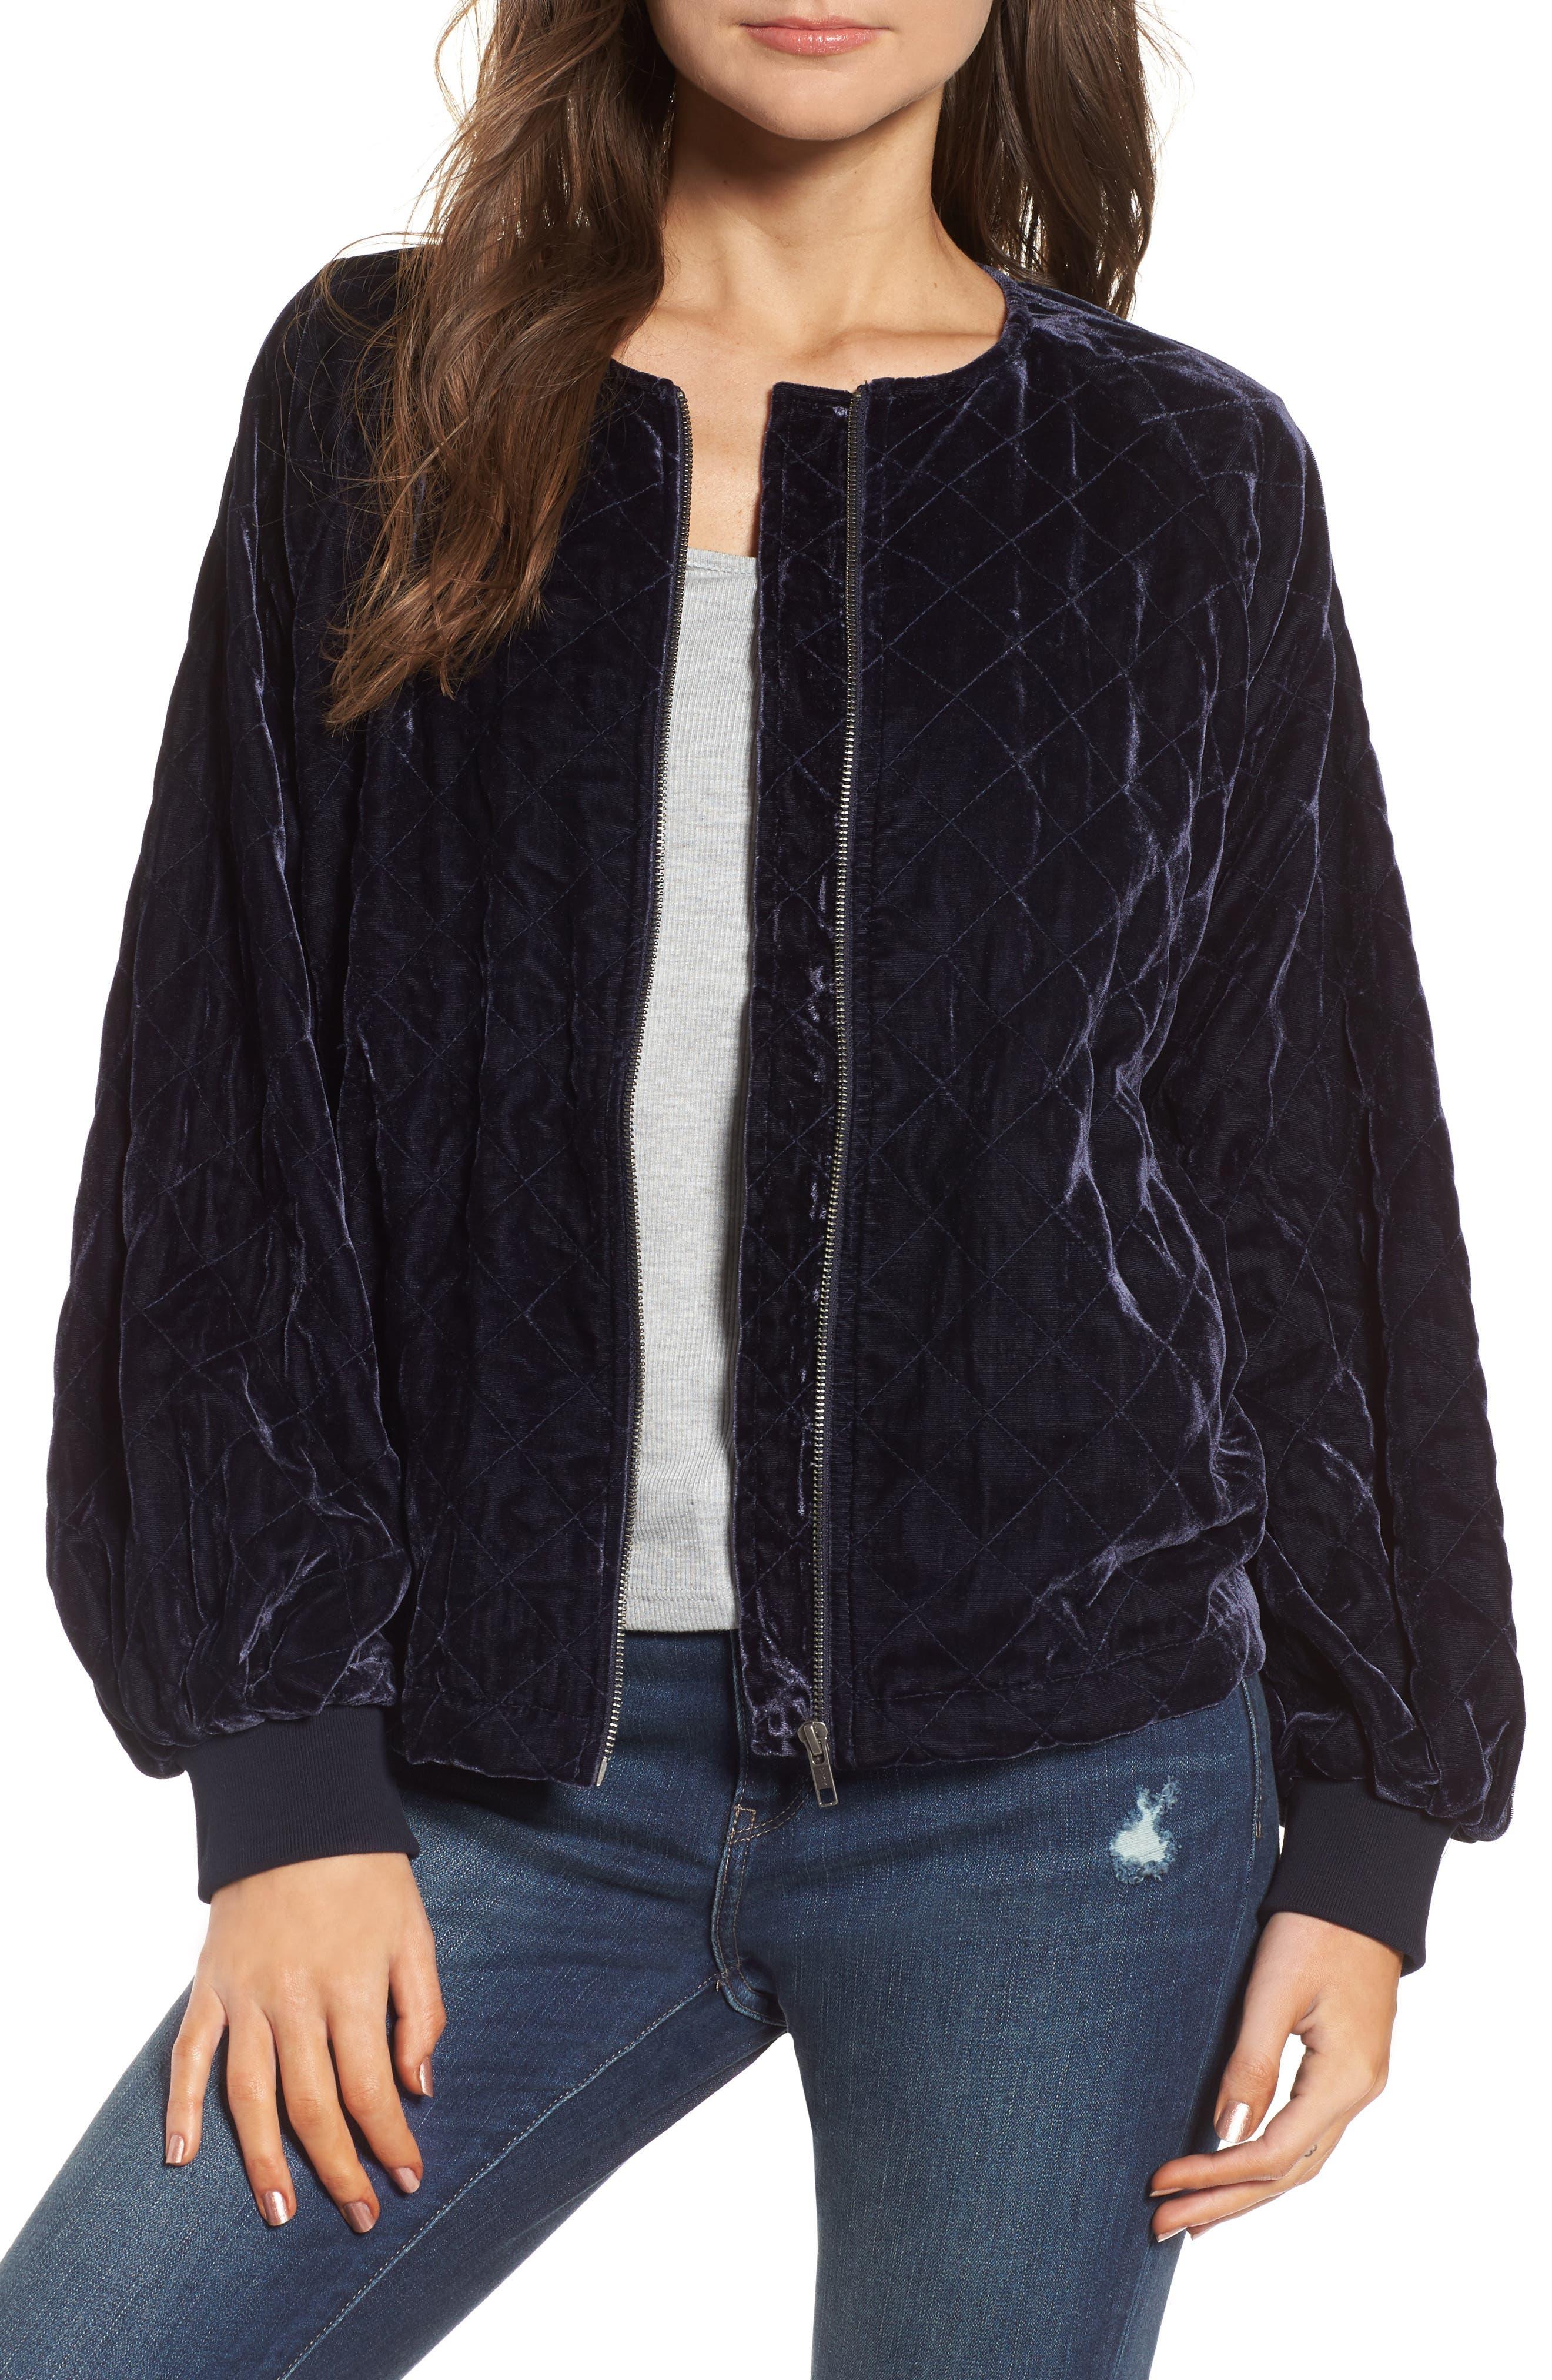 Main Image - Hinge Quilted Velvet Jacket